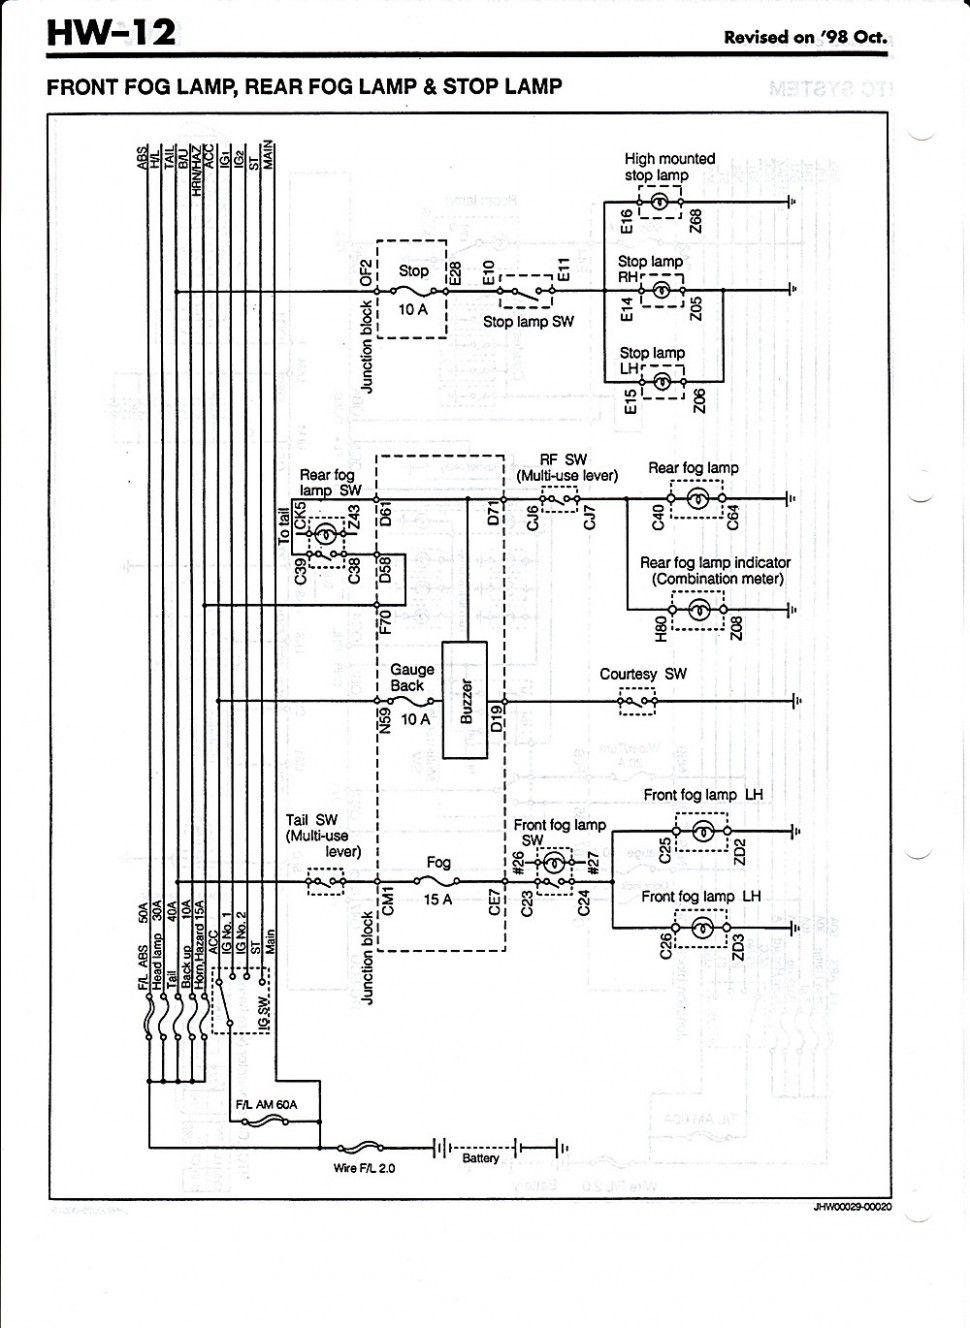 Daihatsu Hijet Engine Diagram Uk Daihatsu Diagram Electrical Diagram